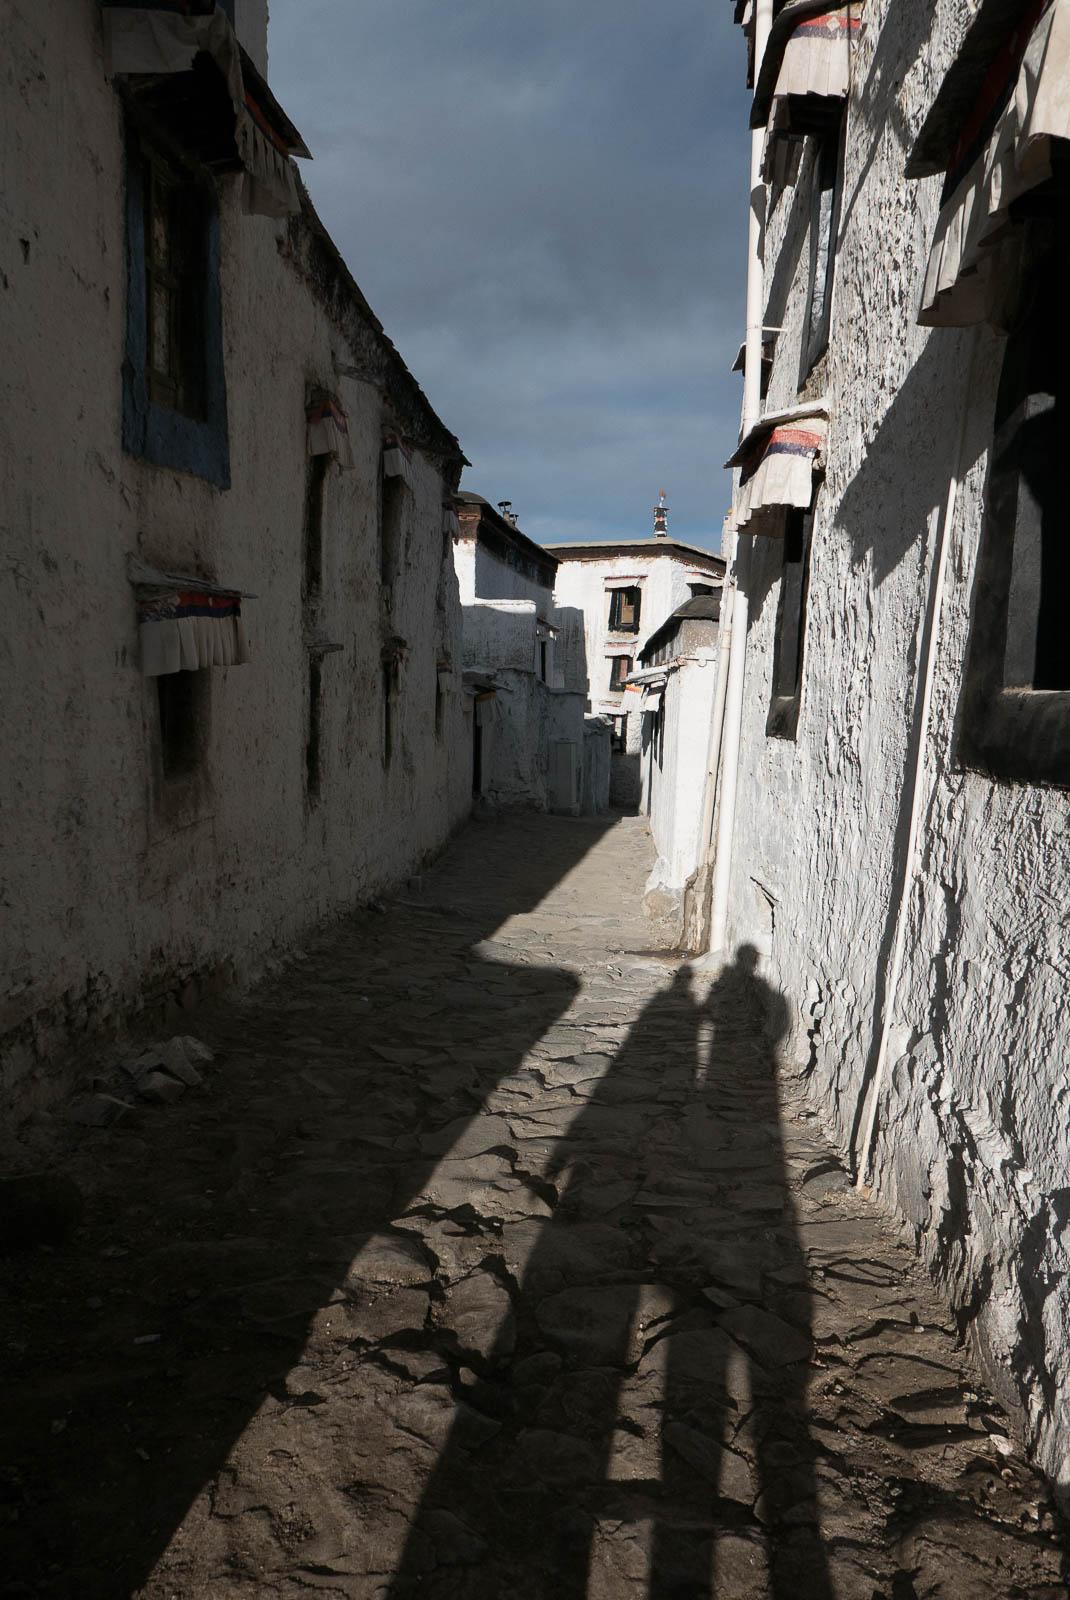 tibet-lo-res-1100850